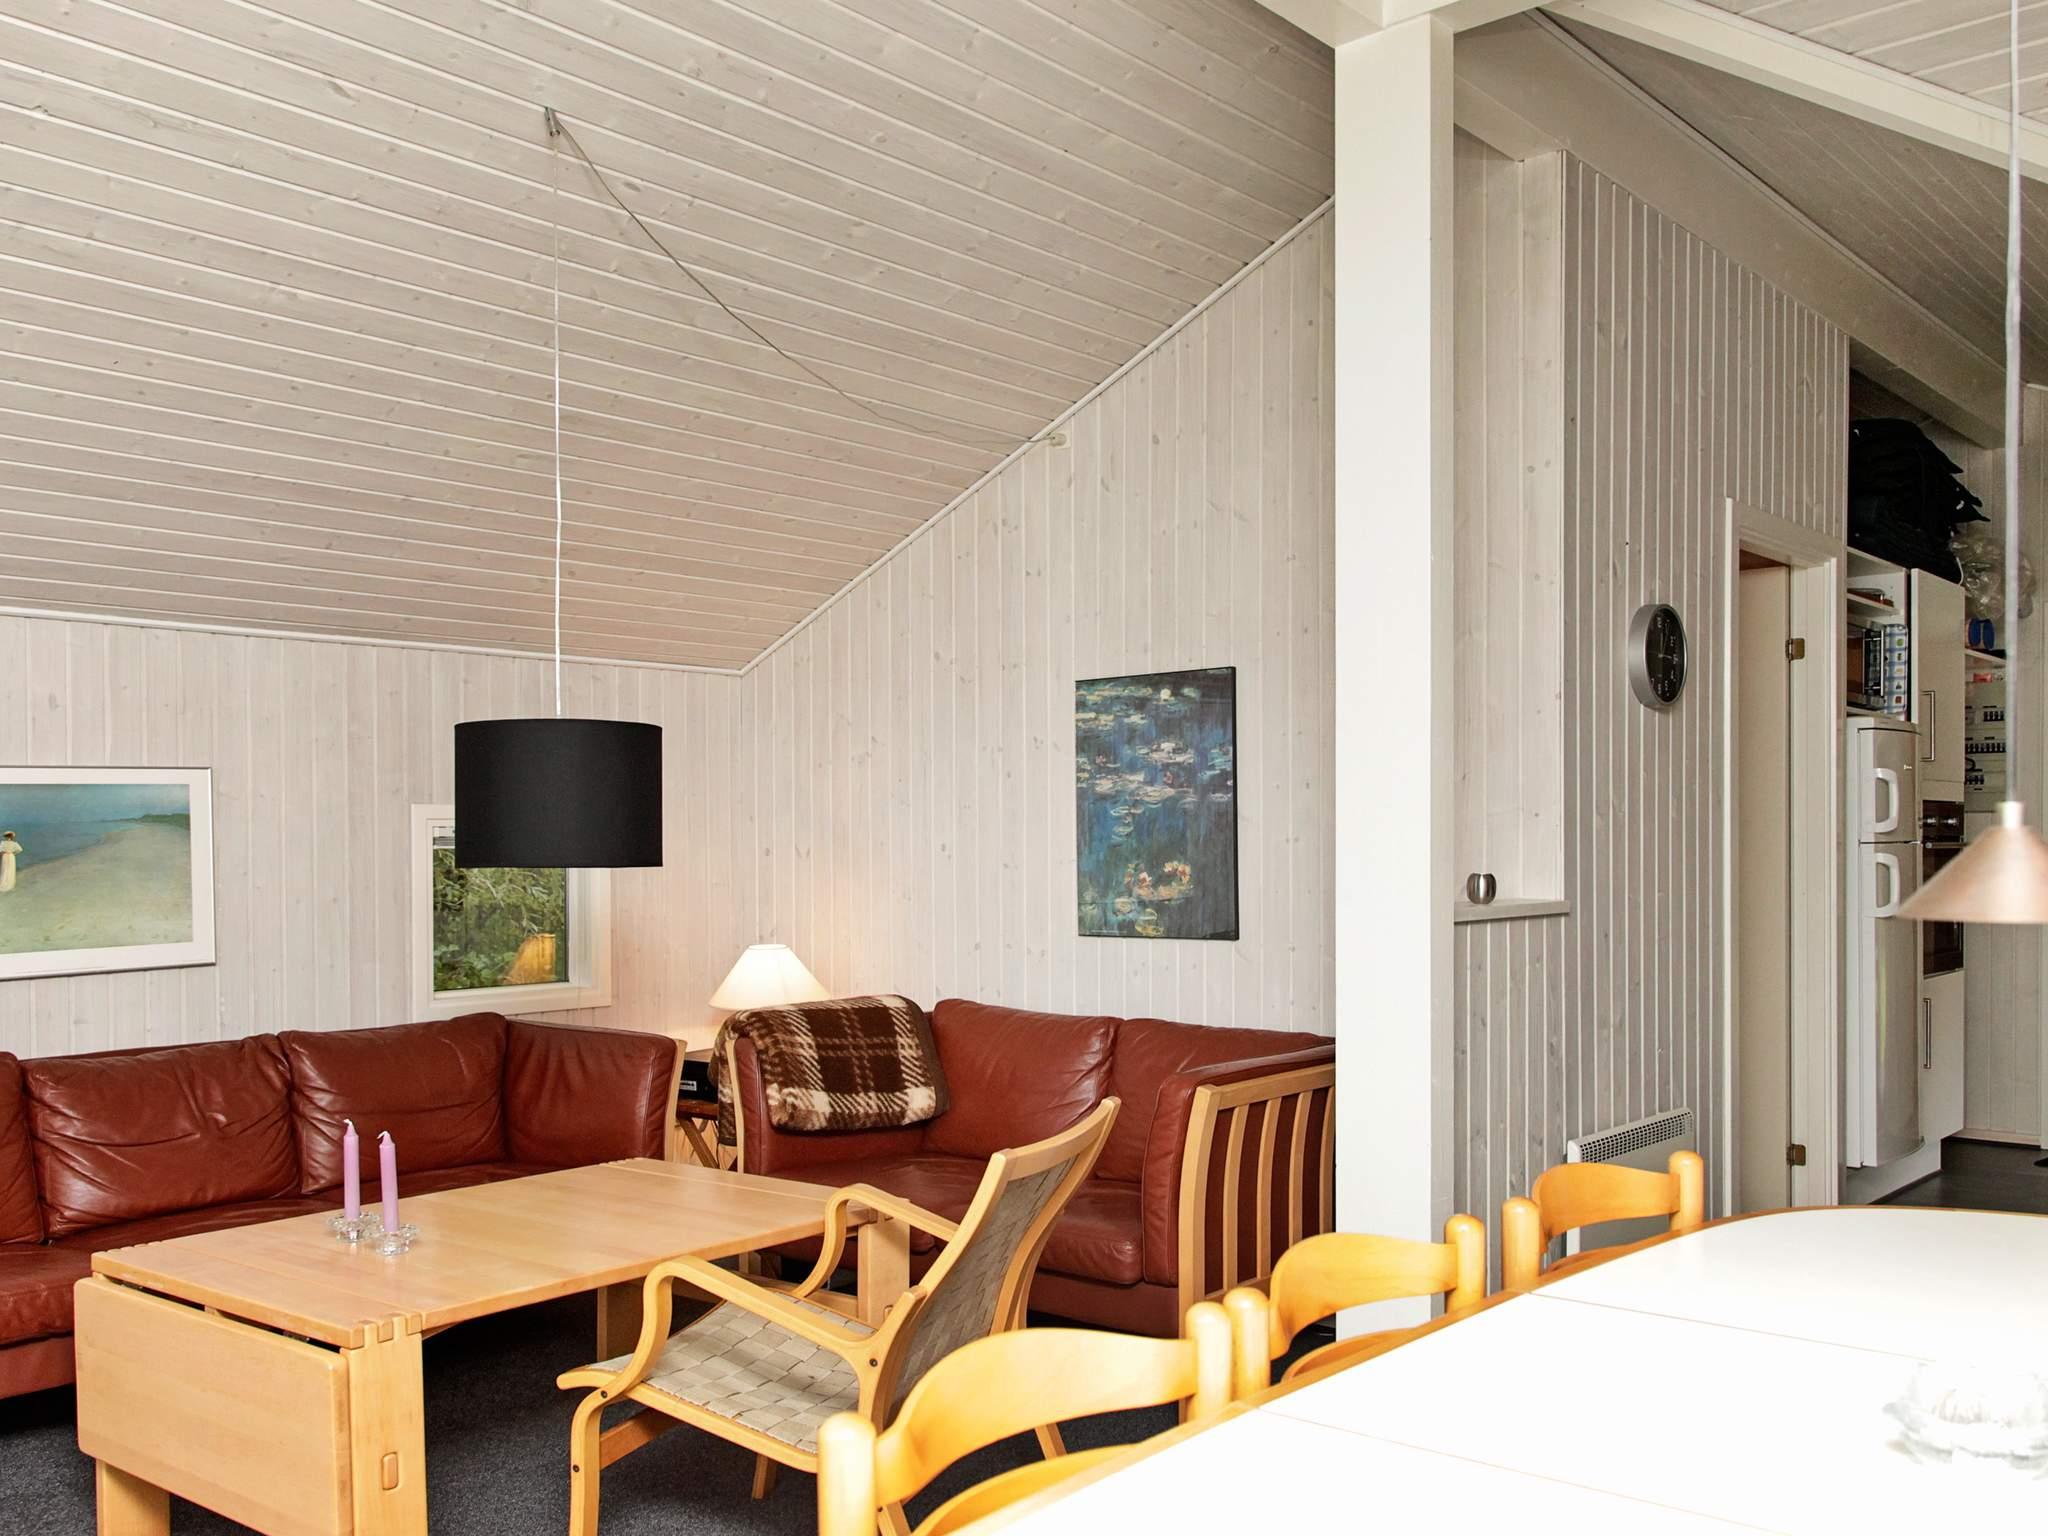 Ferienhaus Ristinge (125632), Ristinge, , Langeland, Dänemark, Bild 15